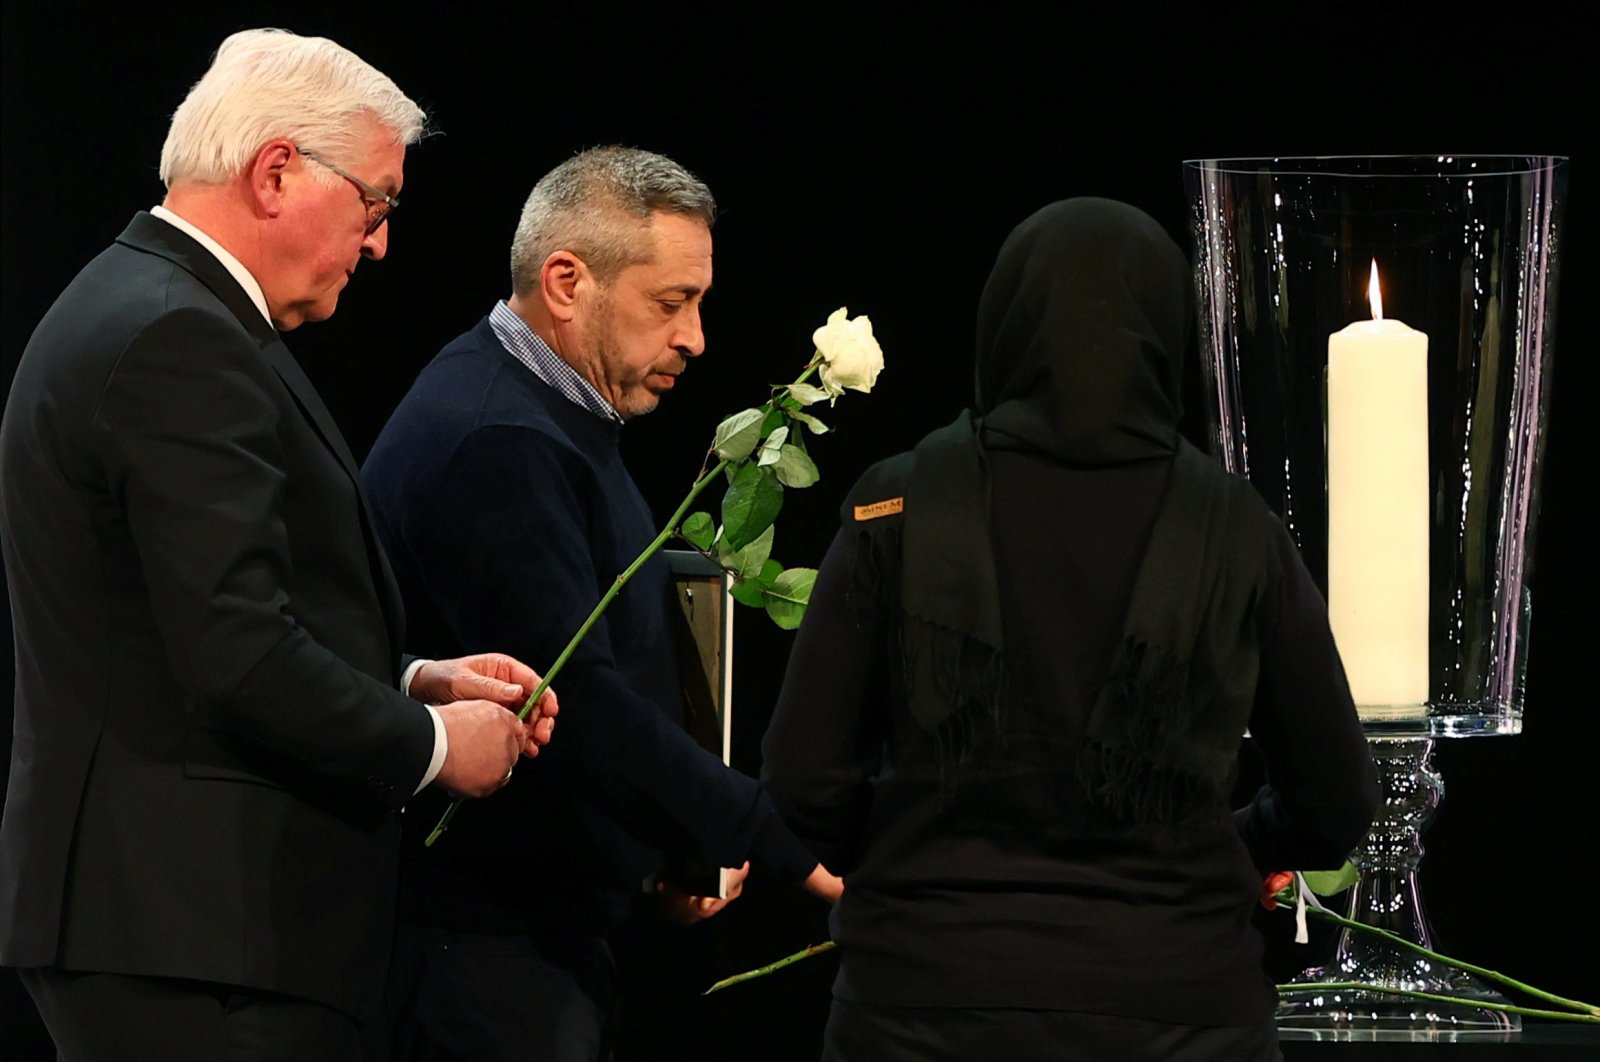 German President Frank-Walter Steinmeier and relatives of victims of the shootings in Hanau lay flowers during the memorial service in Hanau, Germany, March 4, 2020. (AFP Photo)